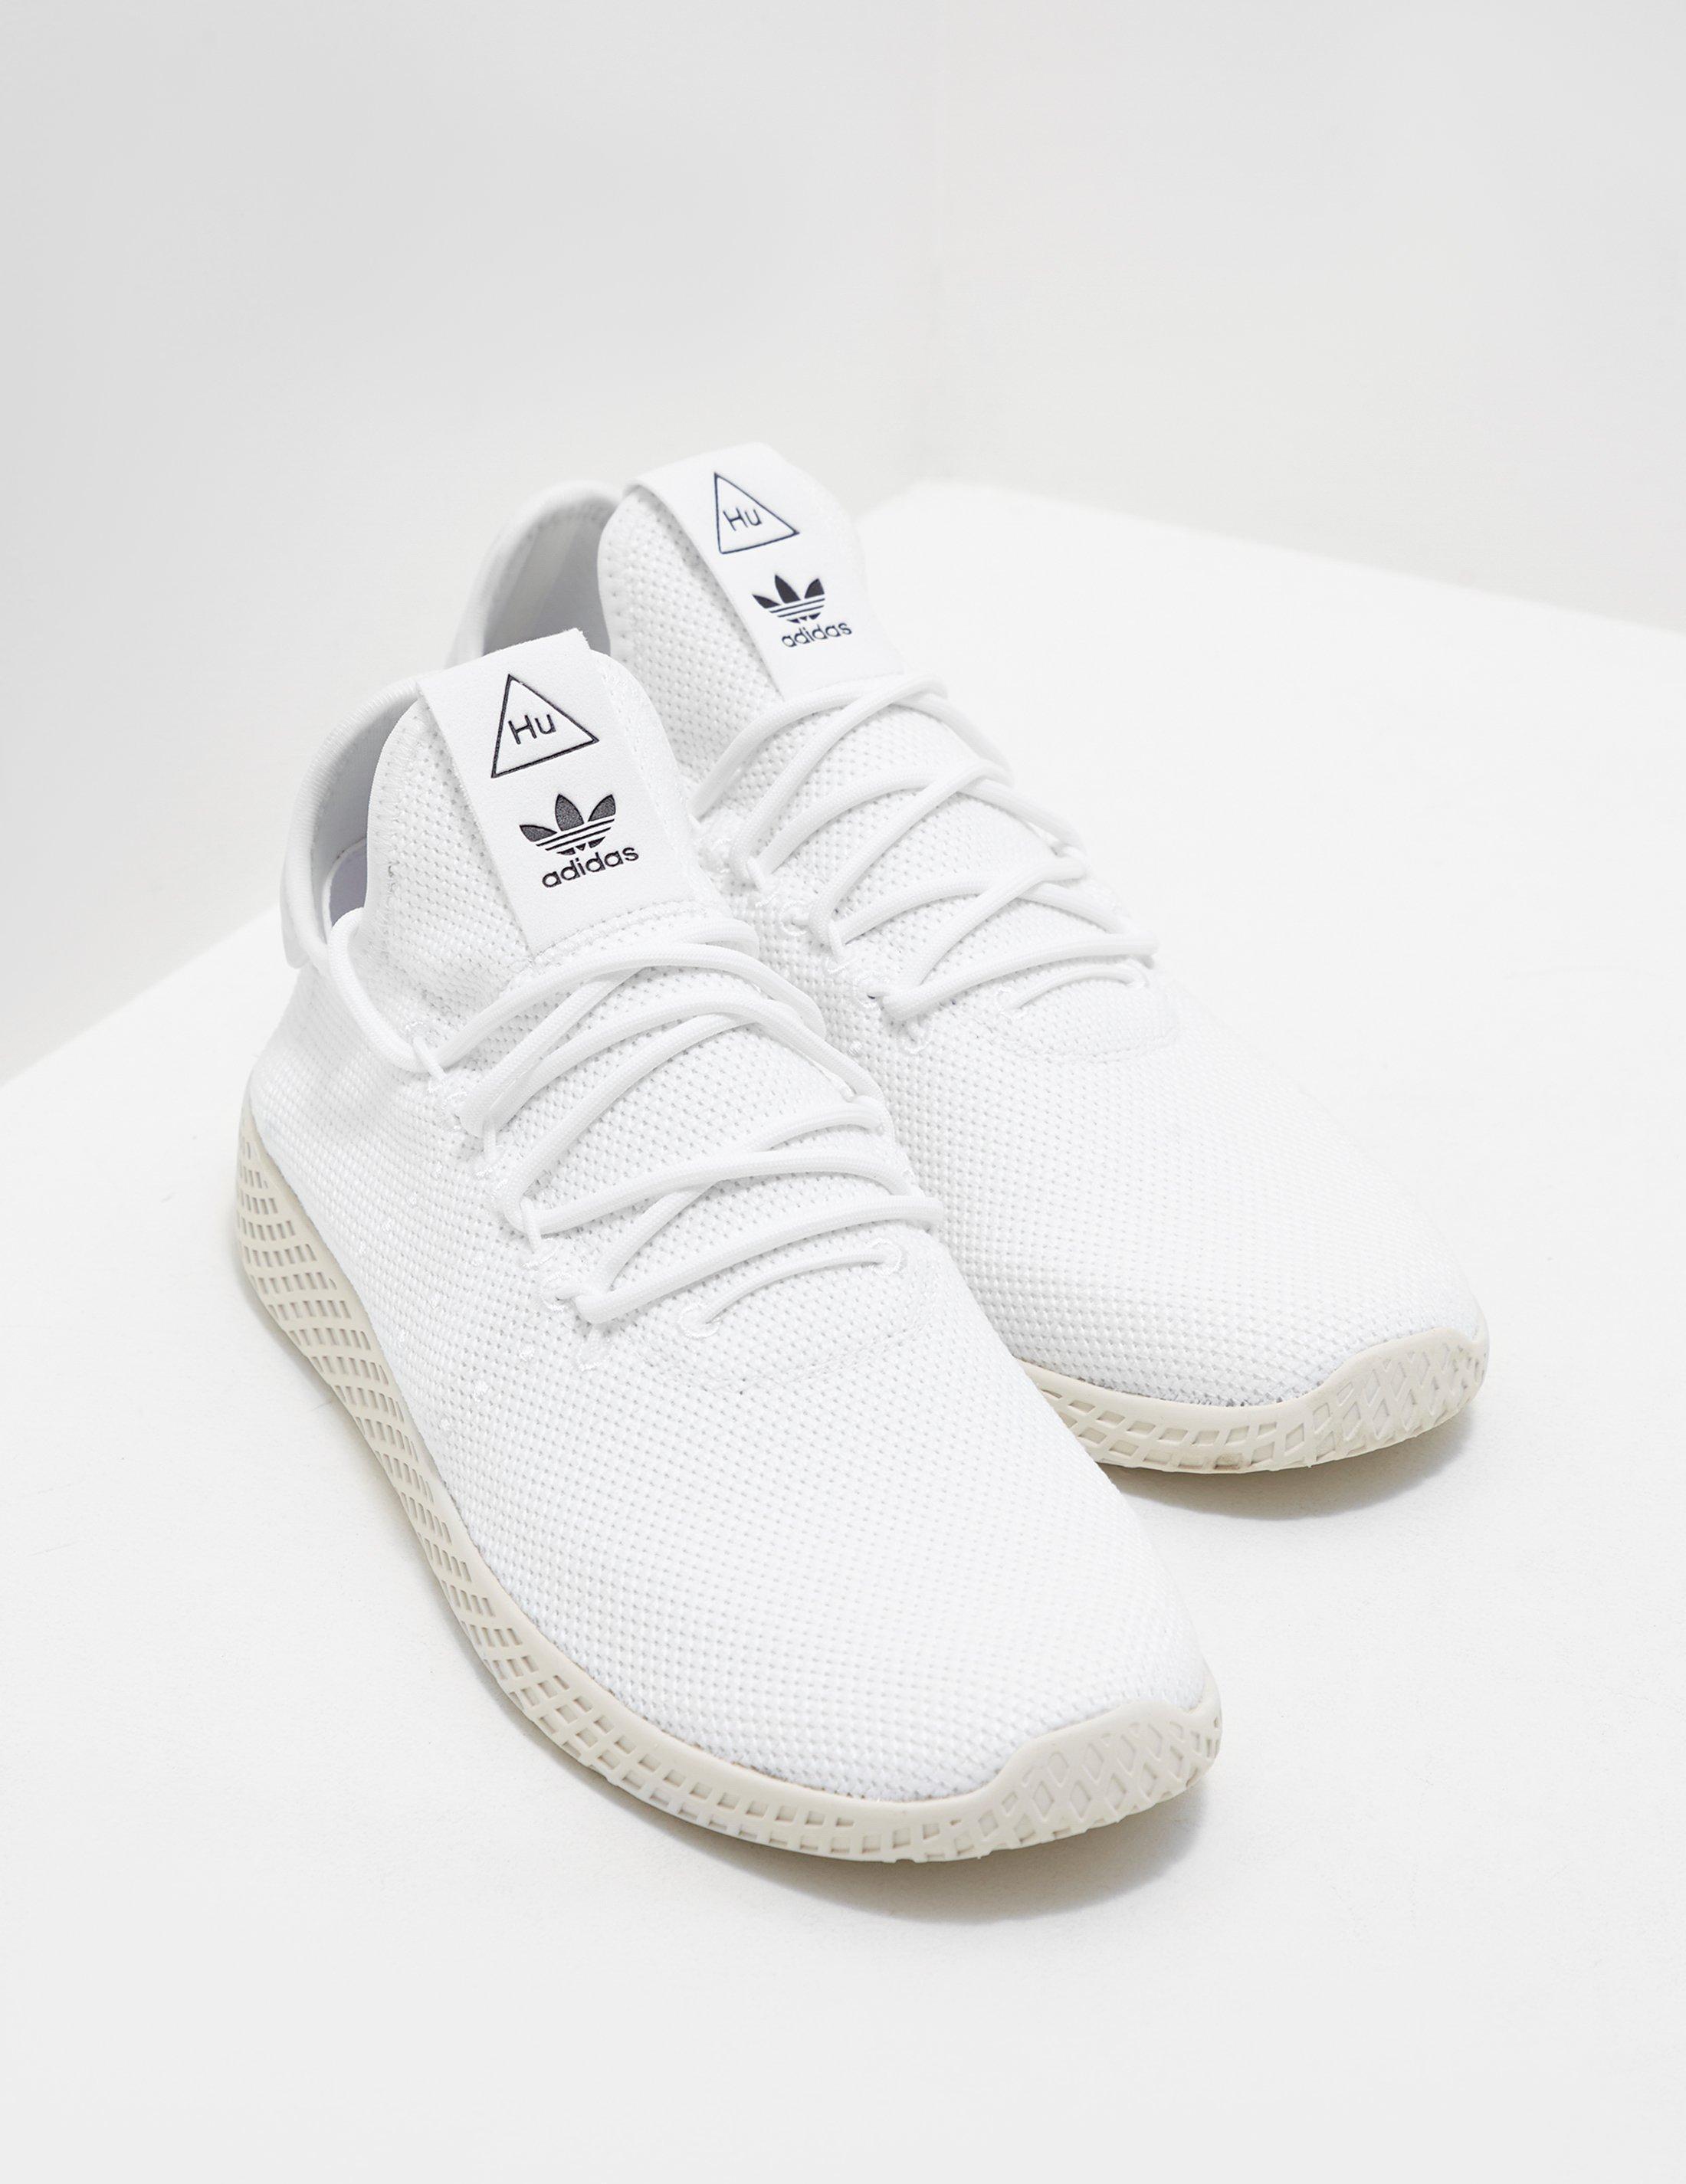 2a4cb50a4179 adidas Originals X Pharrell Williams in White for Men - Lyst